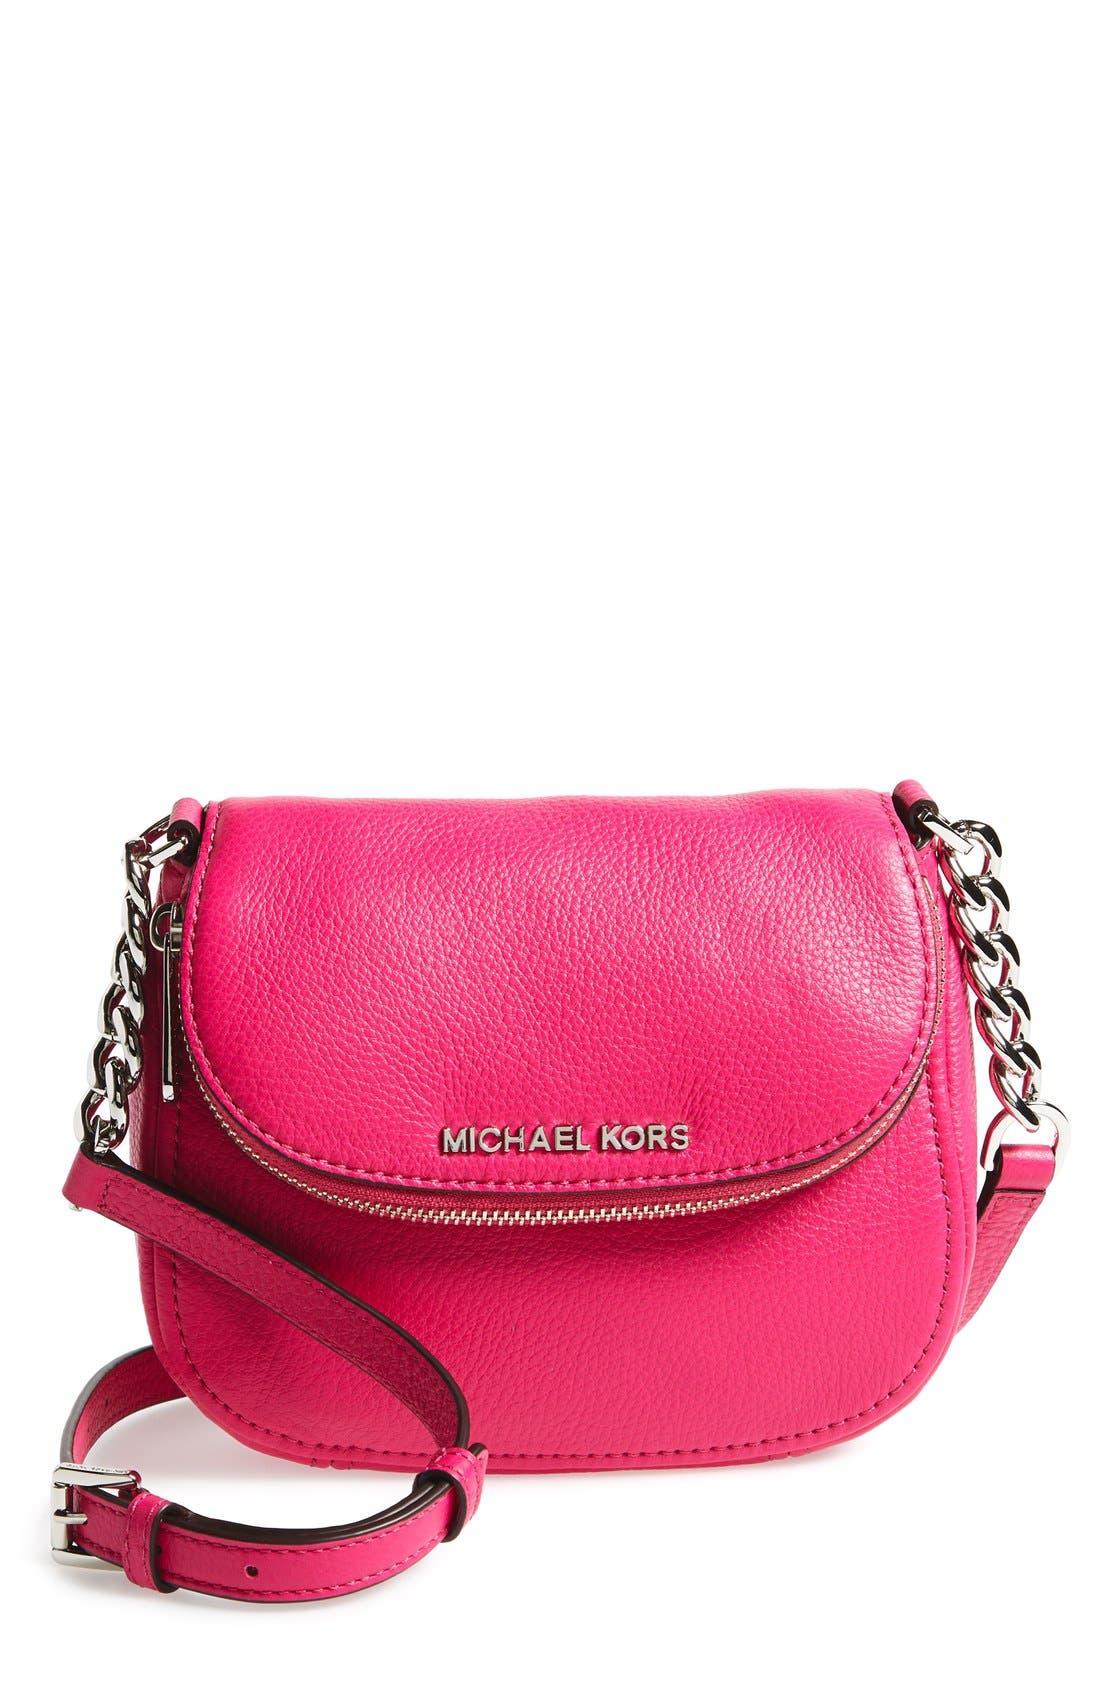 Alternate Image 1 Selected - MICHAEL Michael Kors 'Bedford' Leather Crossbody Bag